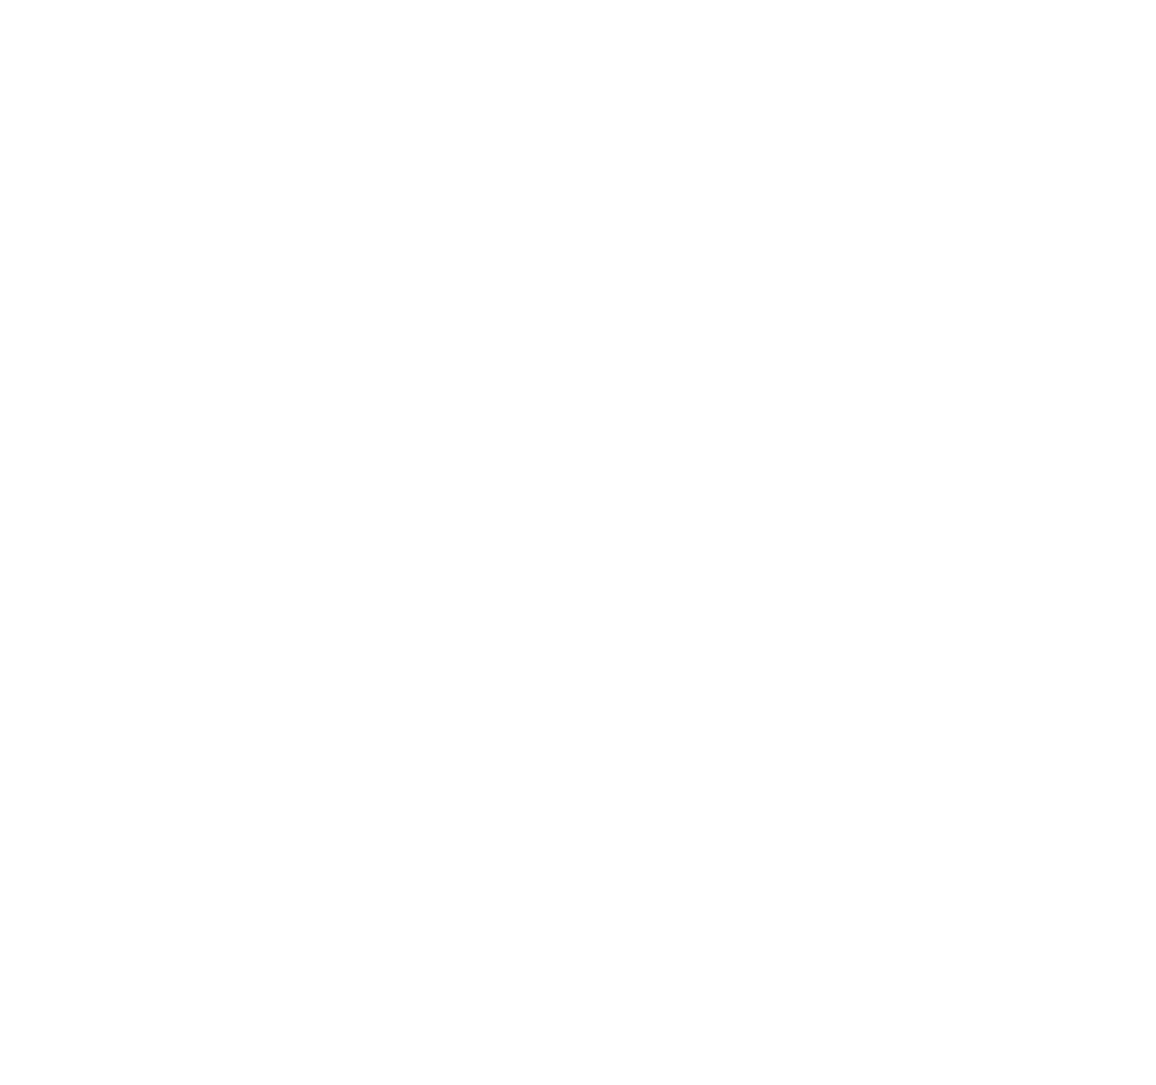 Brewniverse